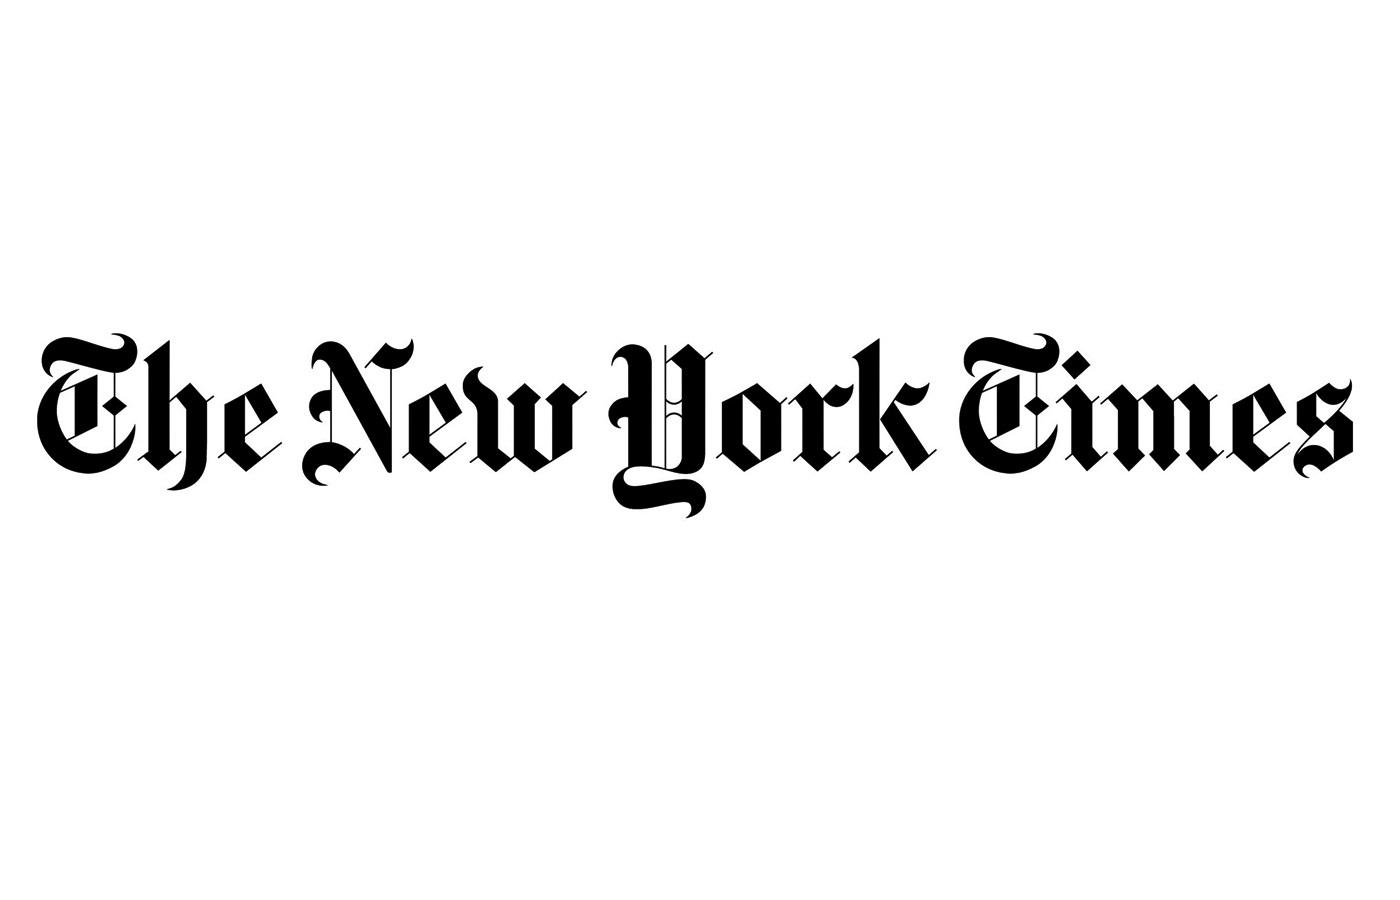 new-york-times-logo-8